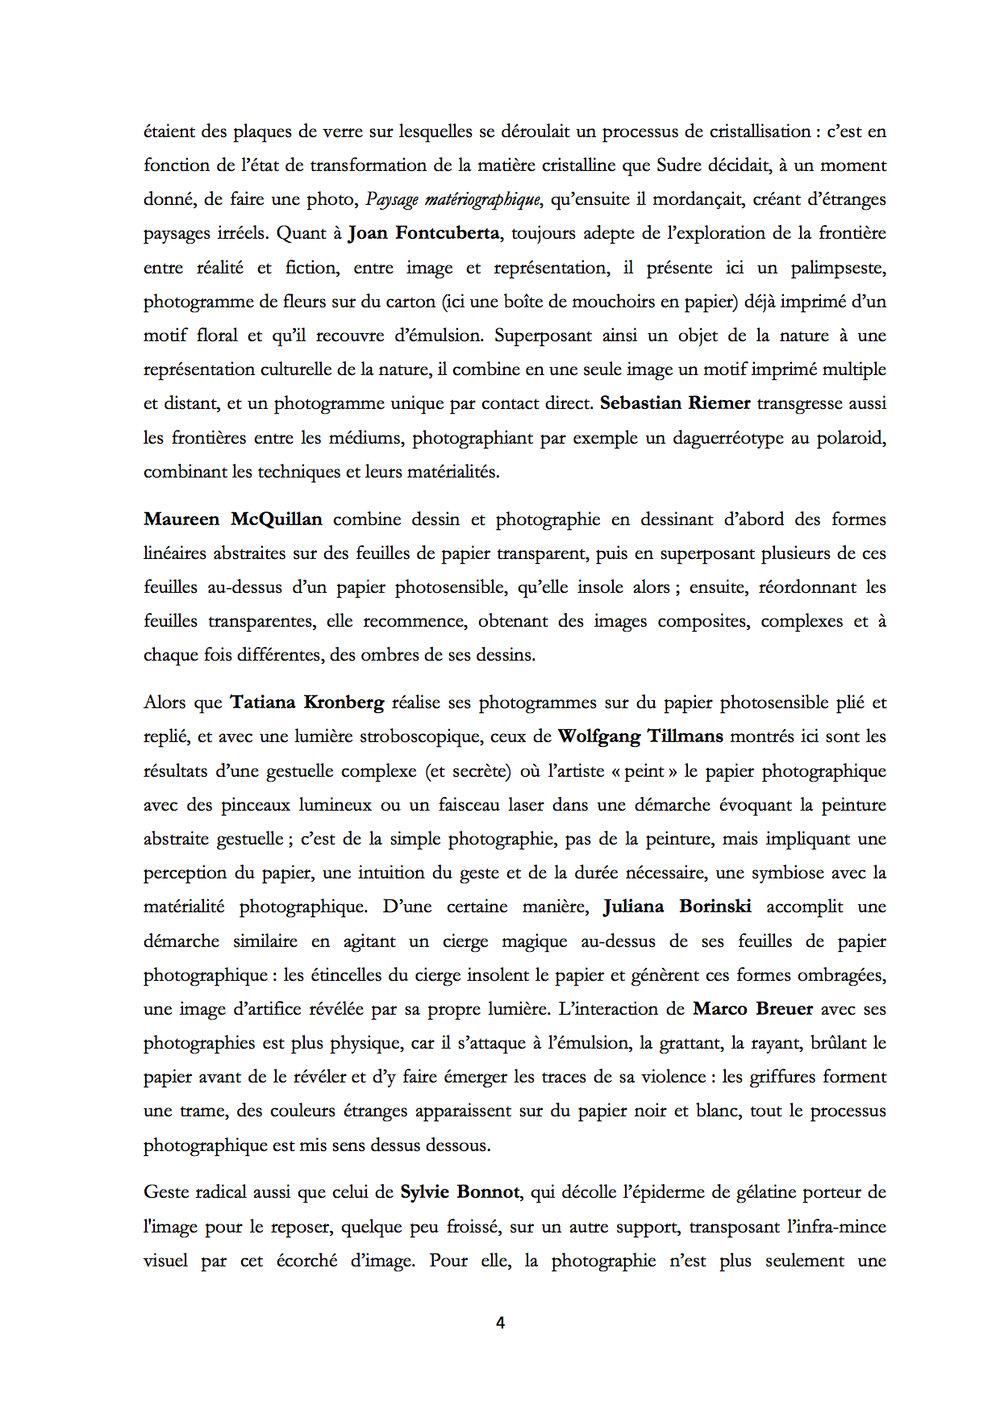 MARC LENOT text4.jpg